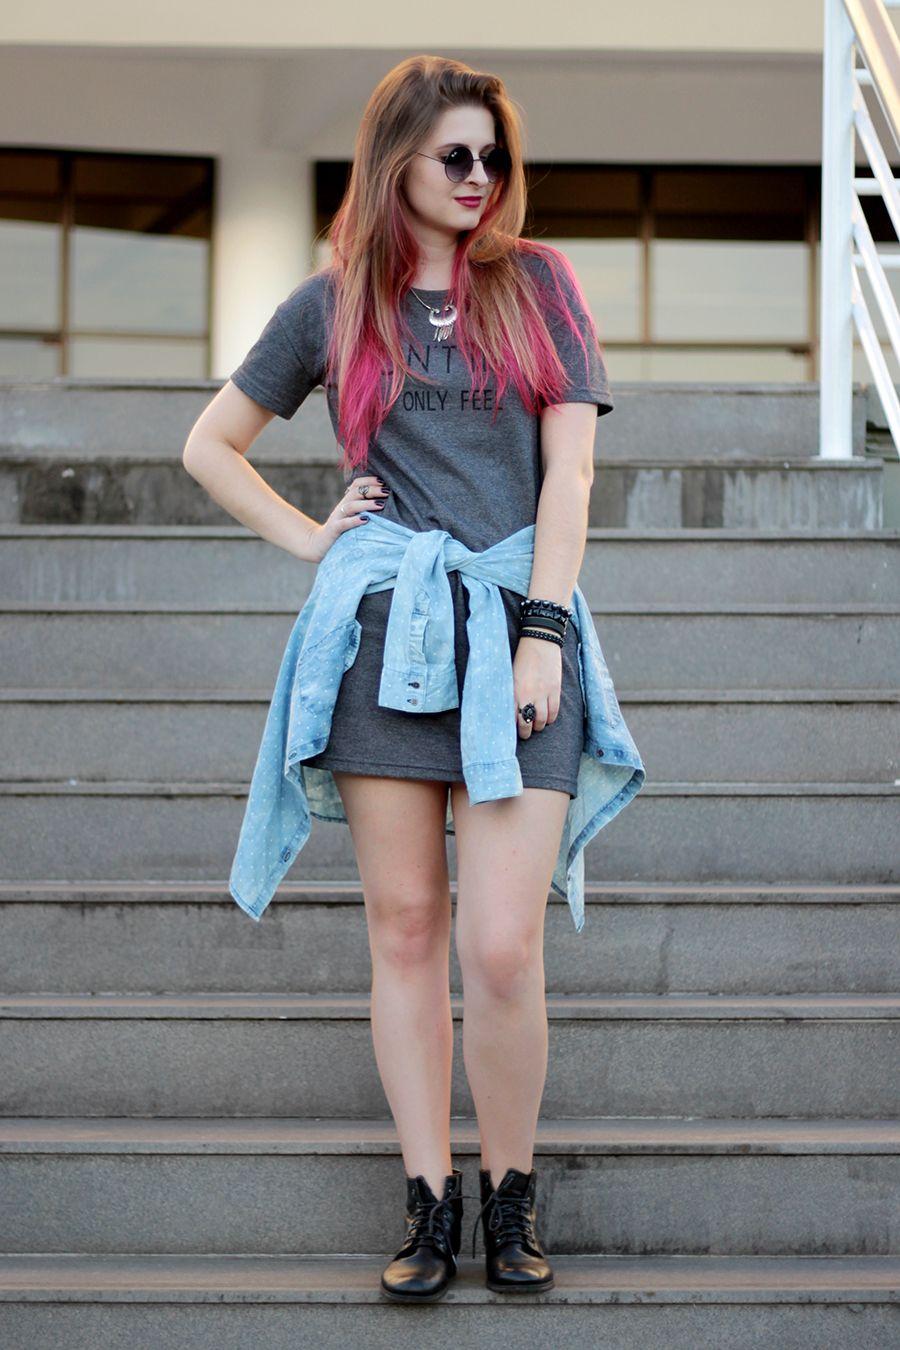 Vestido jeans com camisa jeans